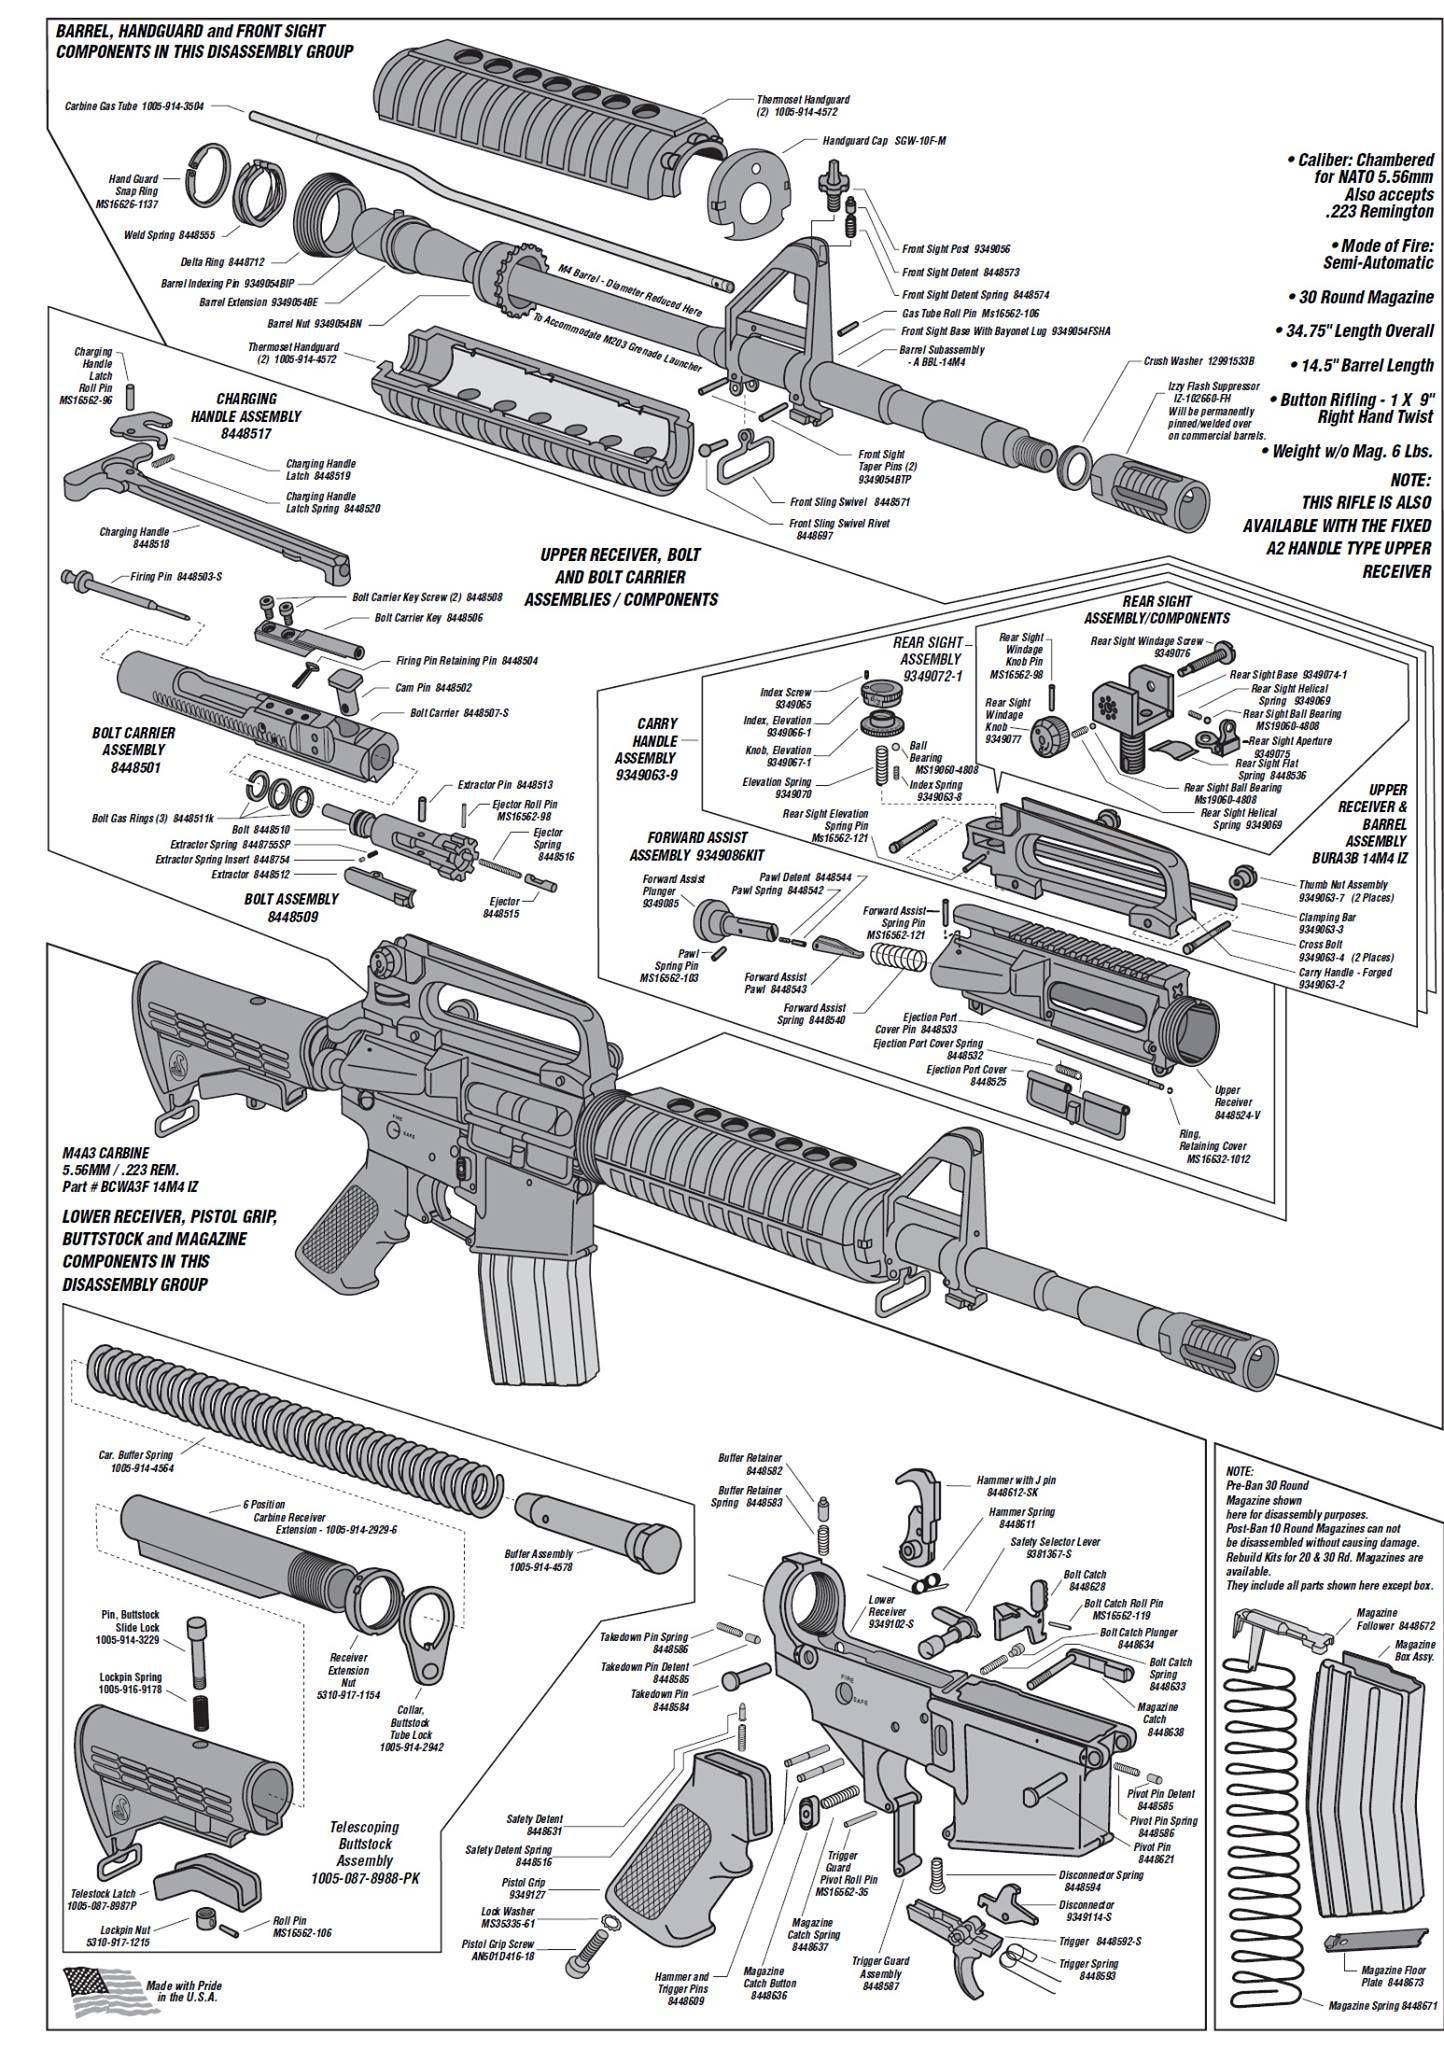 Parts Breakdown Ar 15